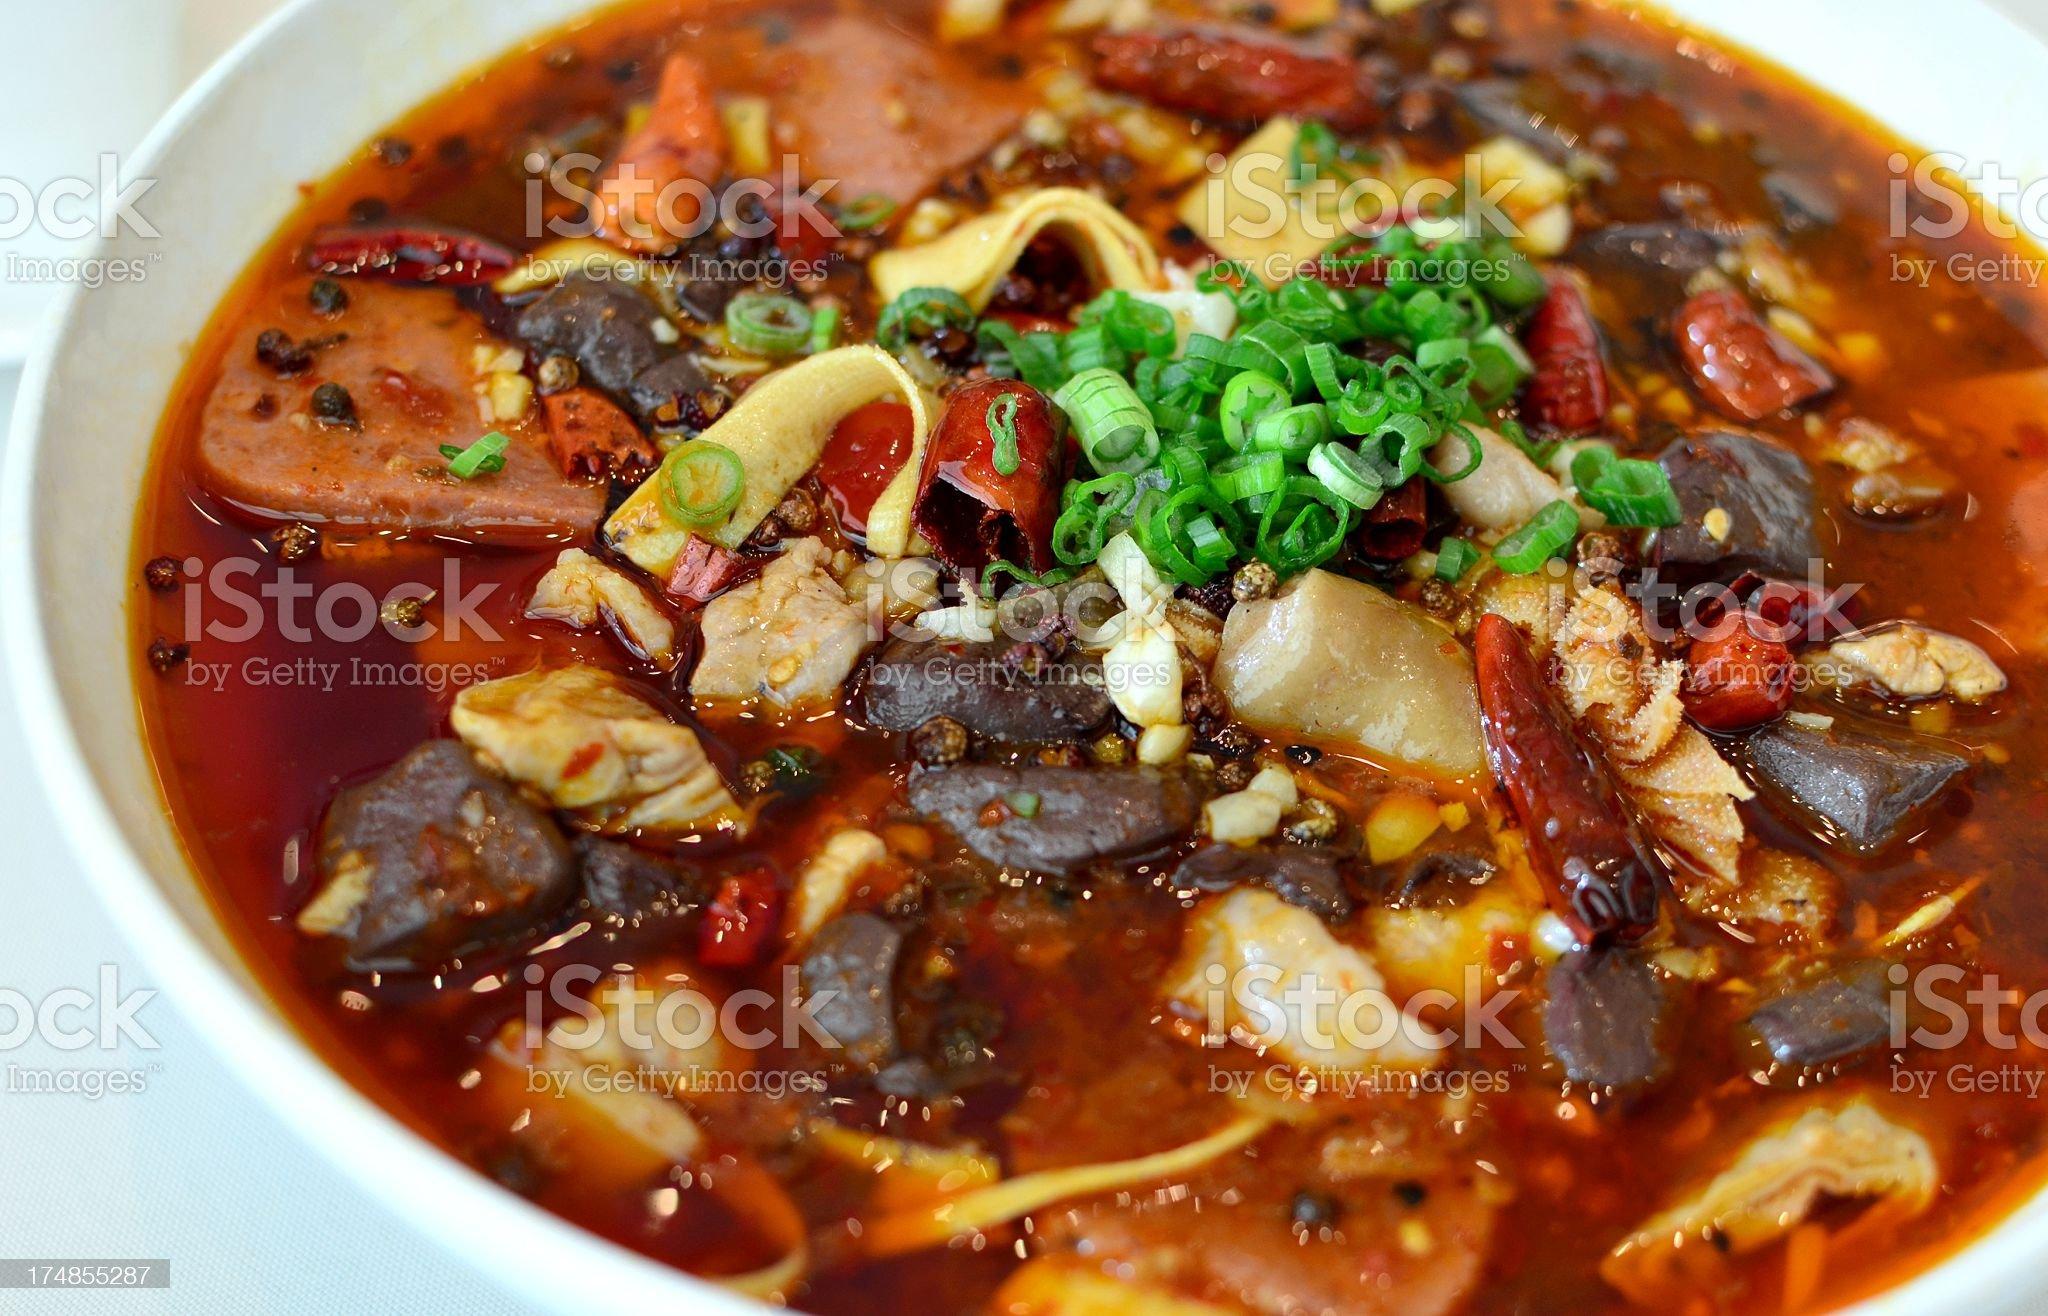 Szechuan spicy dish royalty-free stock photo